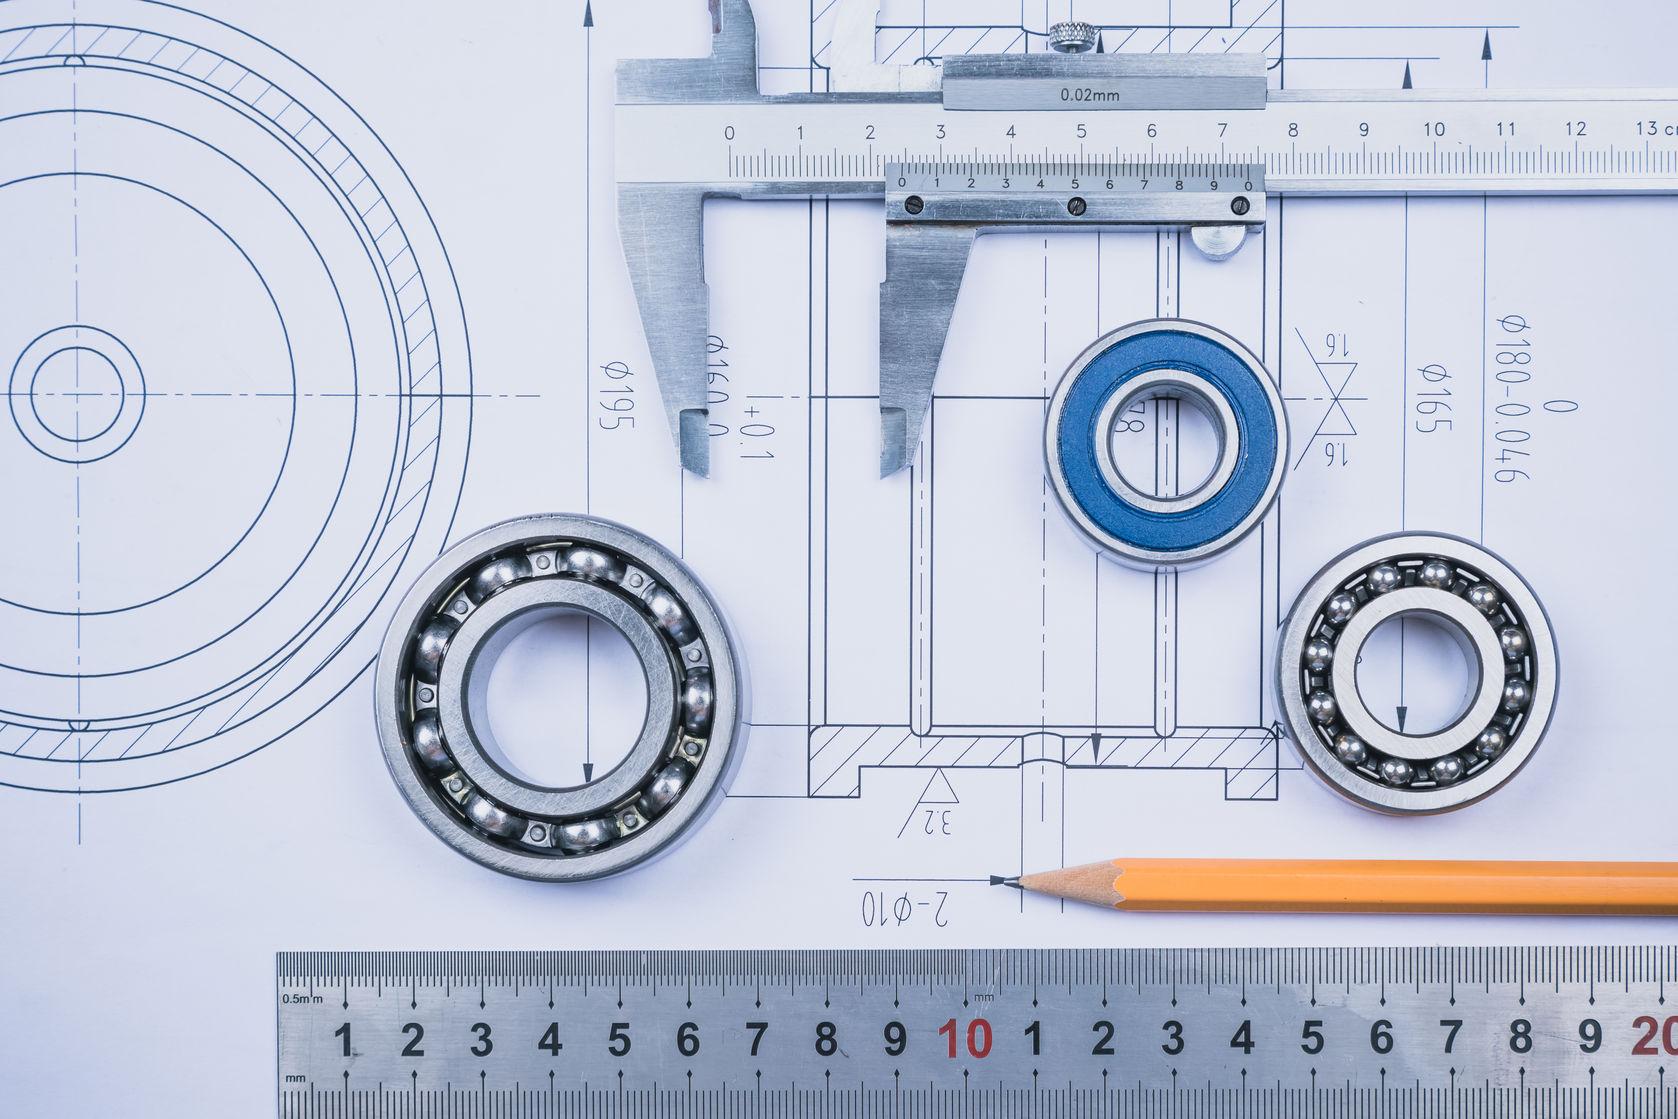 G2 Product Design Consultants